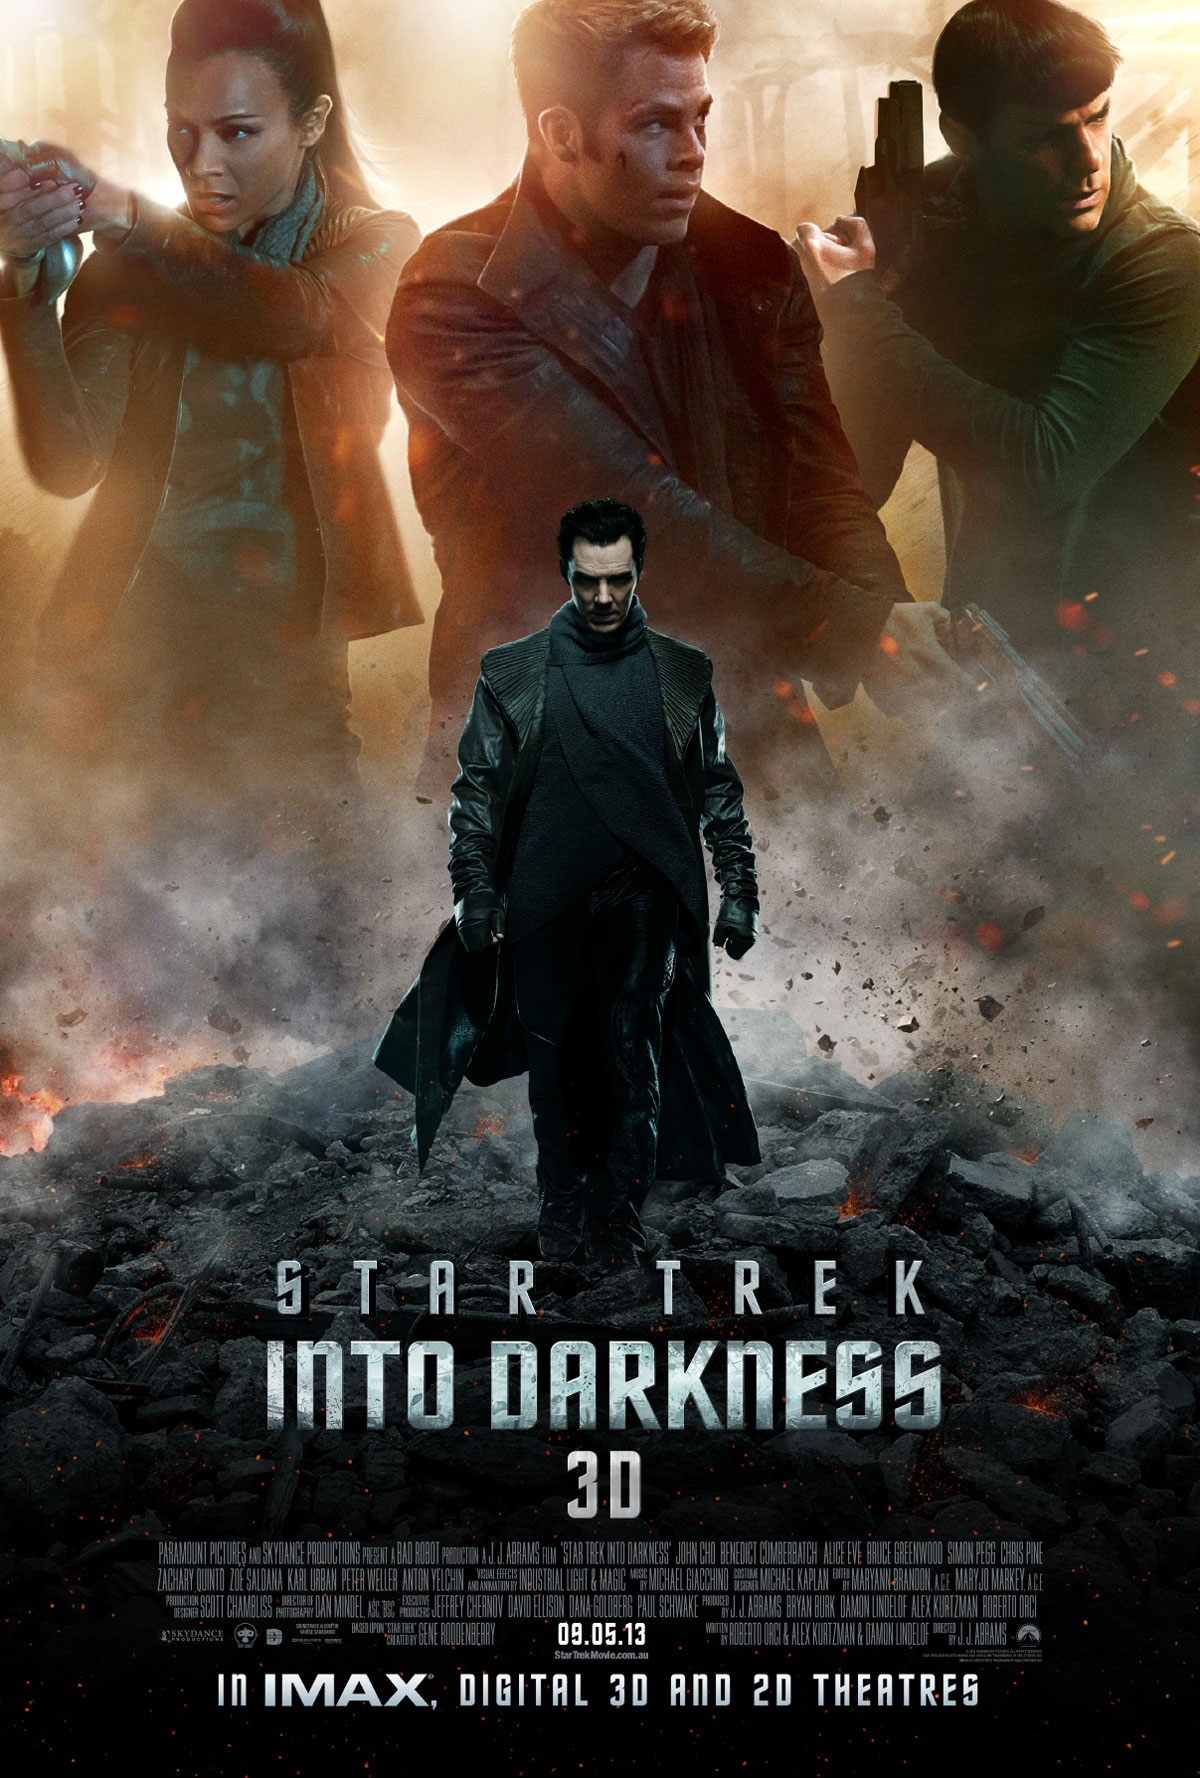 Star Trek Into Darkness New Poster